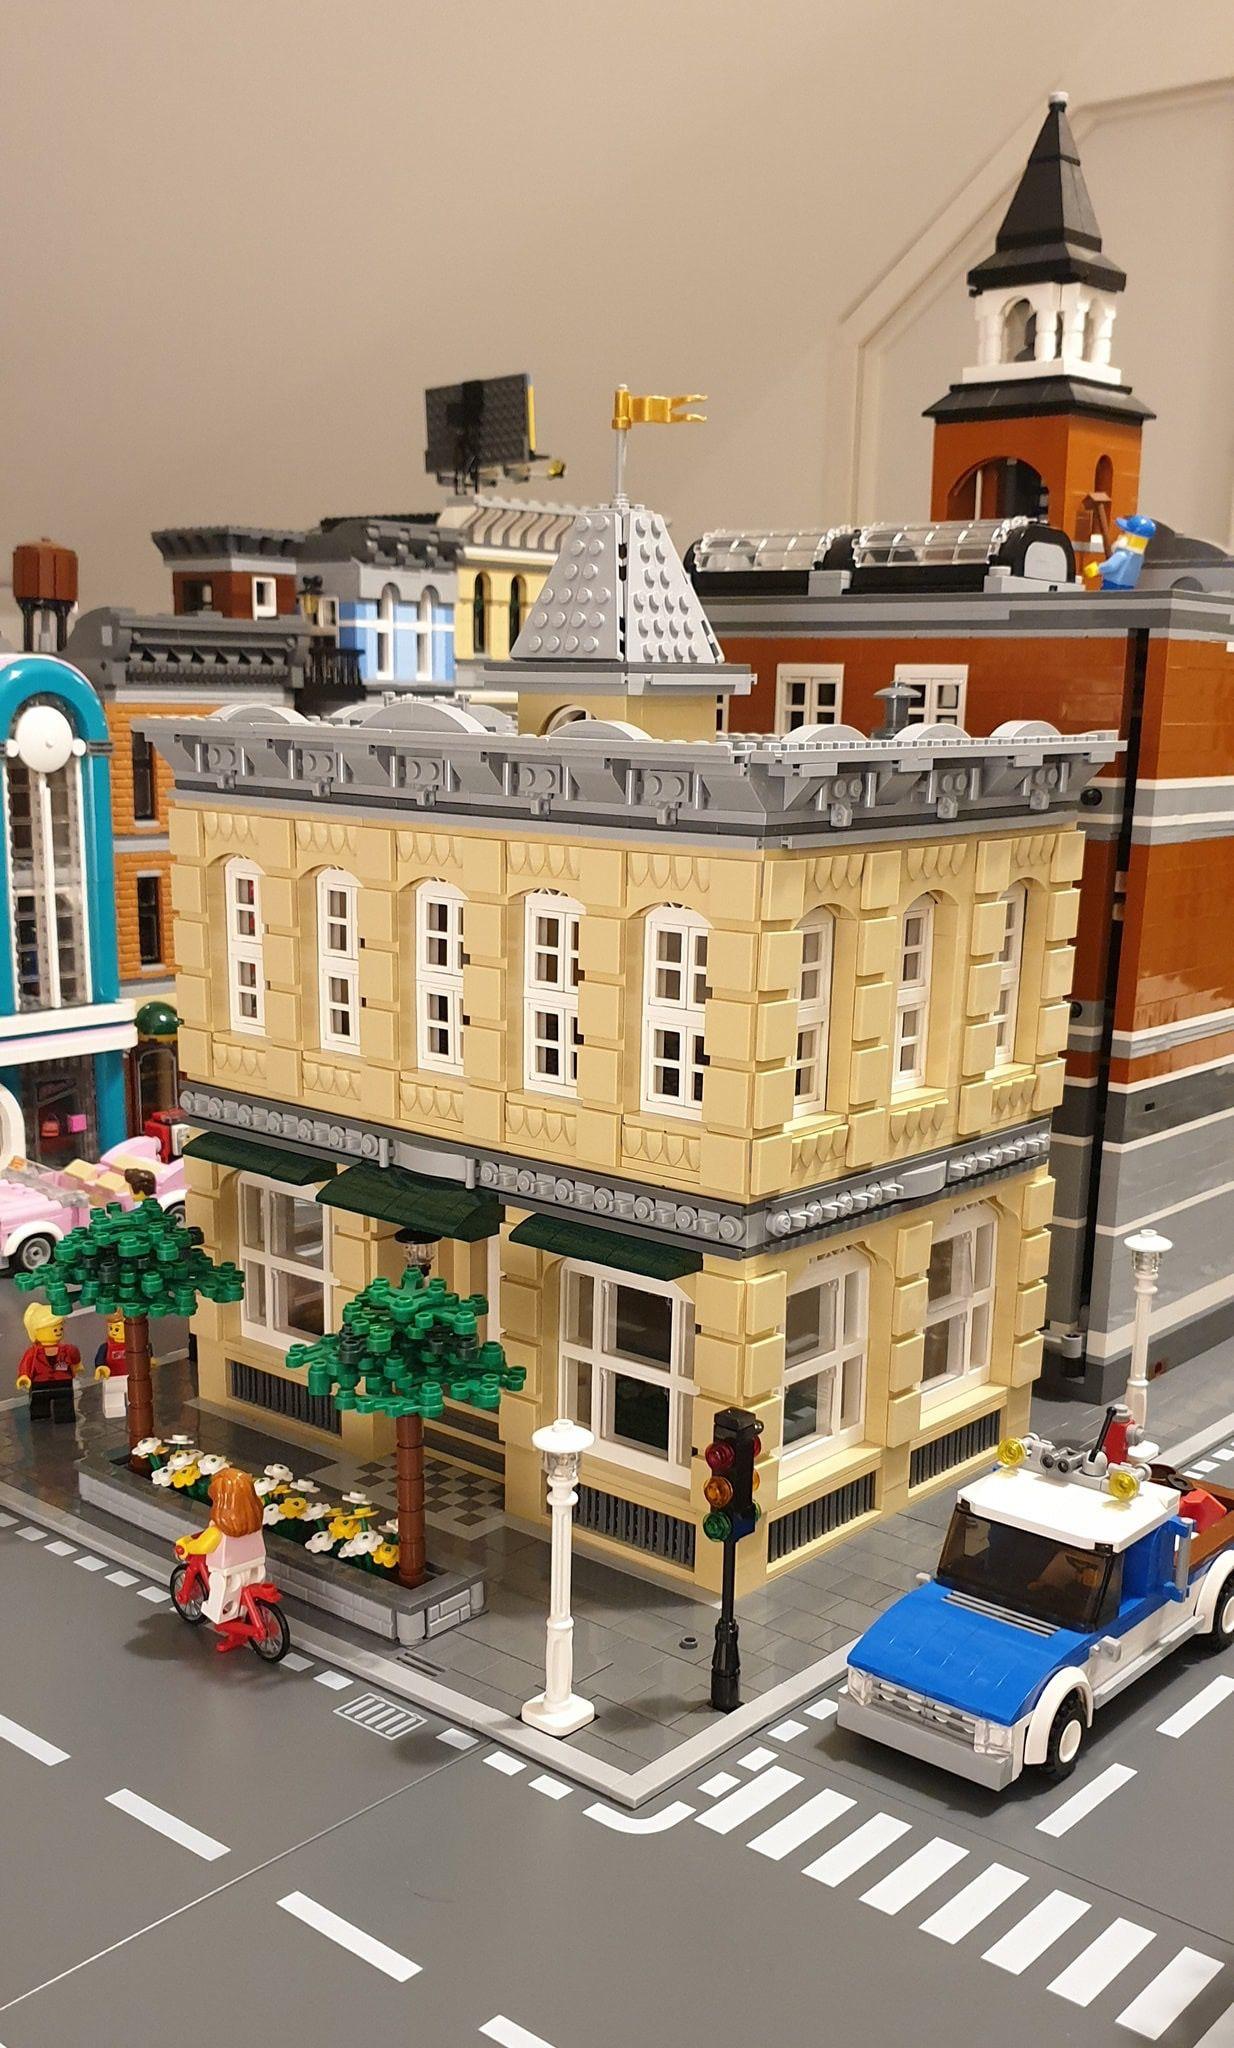 Lego Brick Building | Lego City / Town Ideas | Lego house, Lego